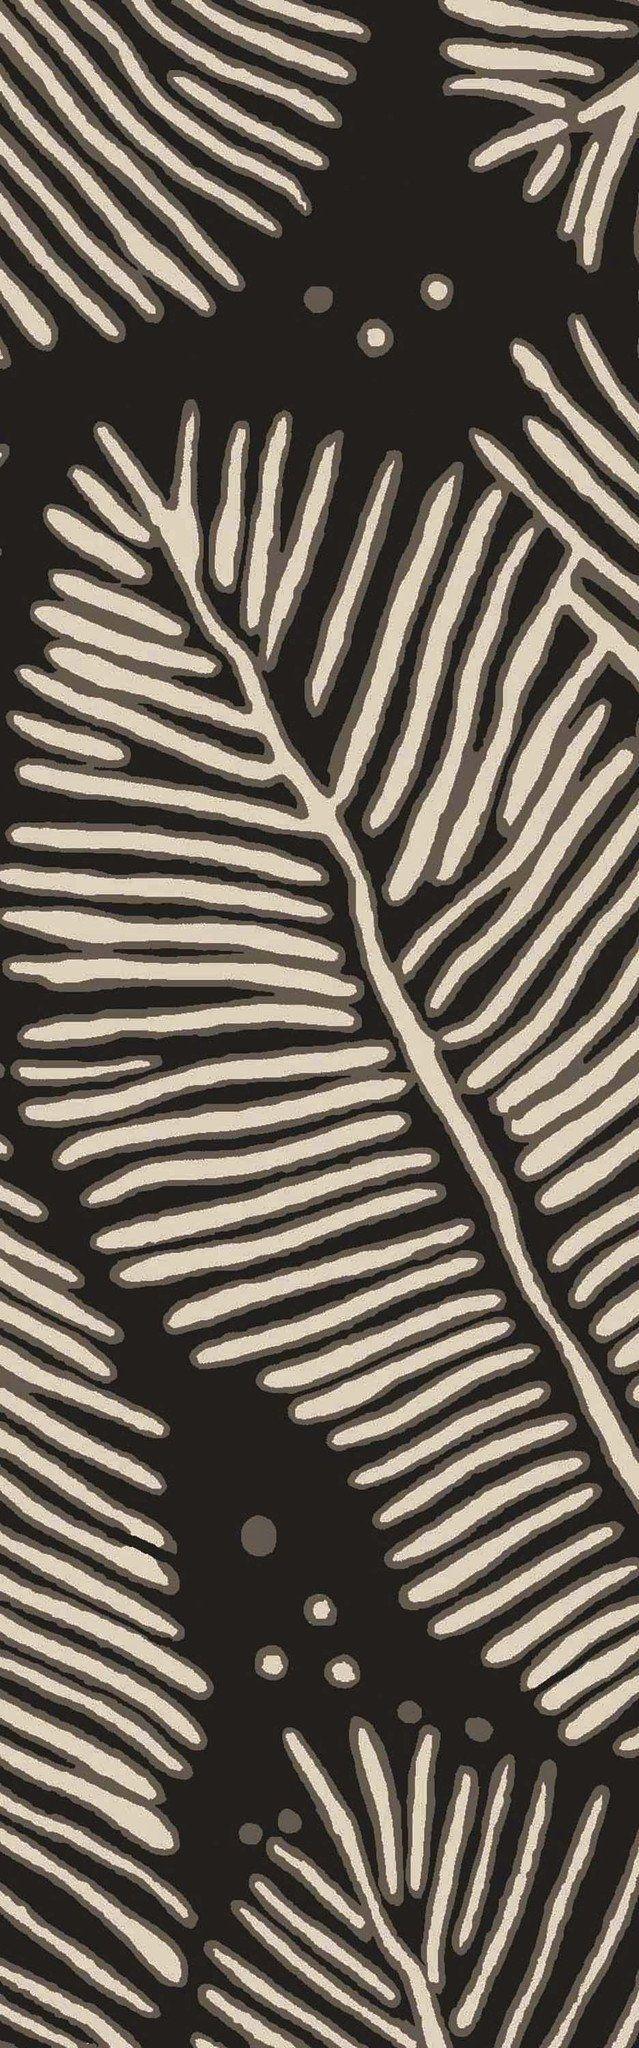 Surya Artisan ARI1000 Black/Neutral Tropical Area Rug